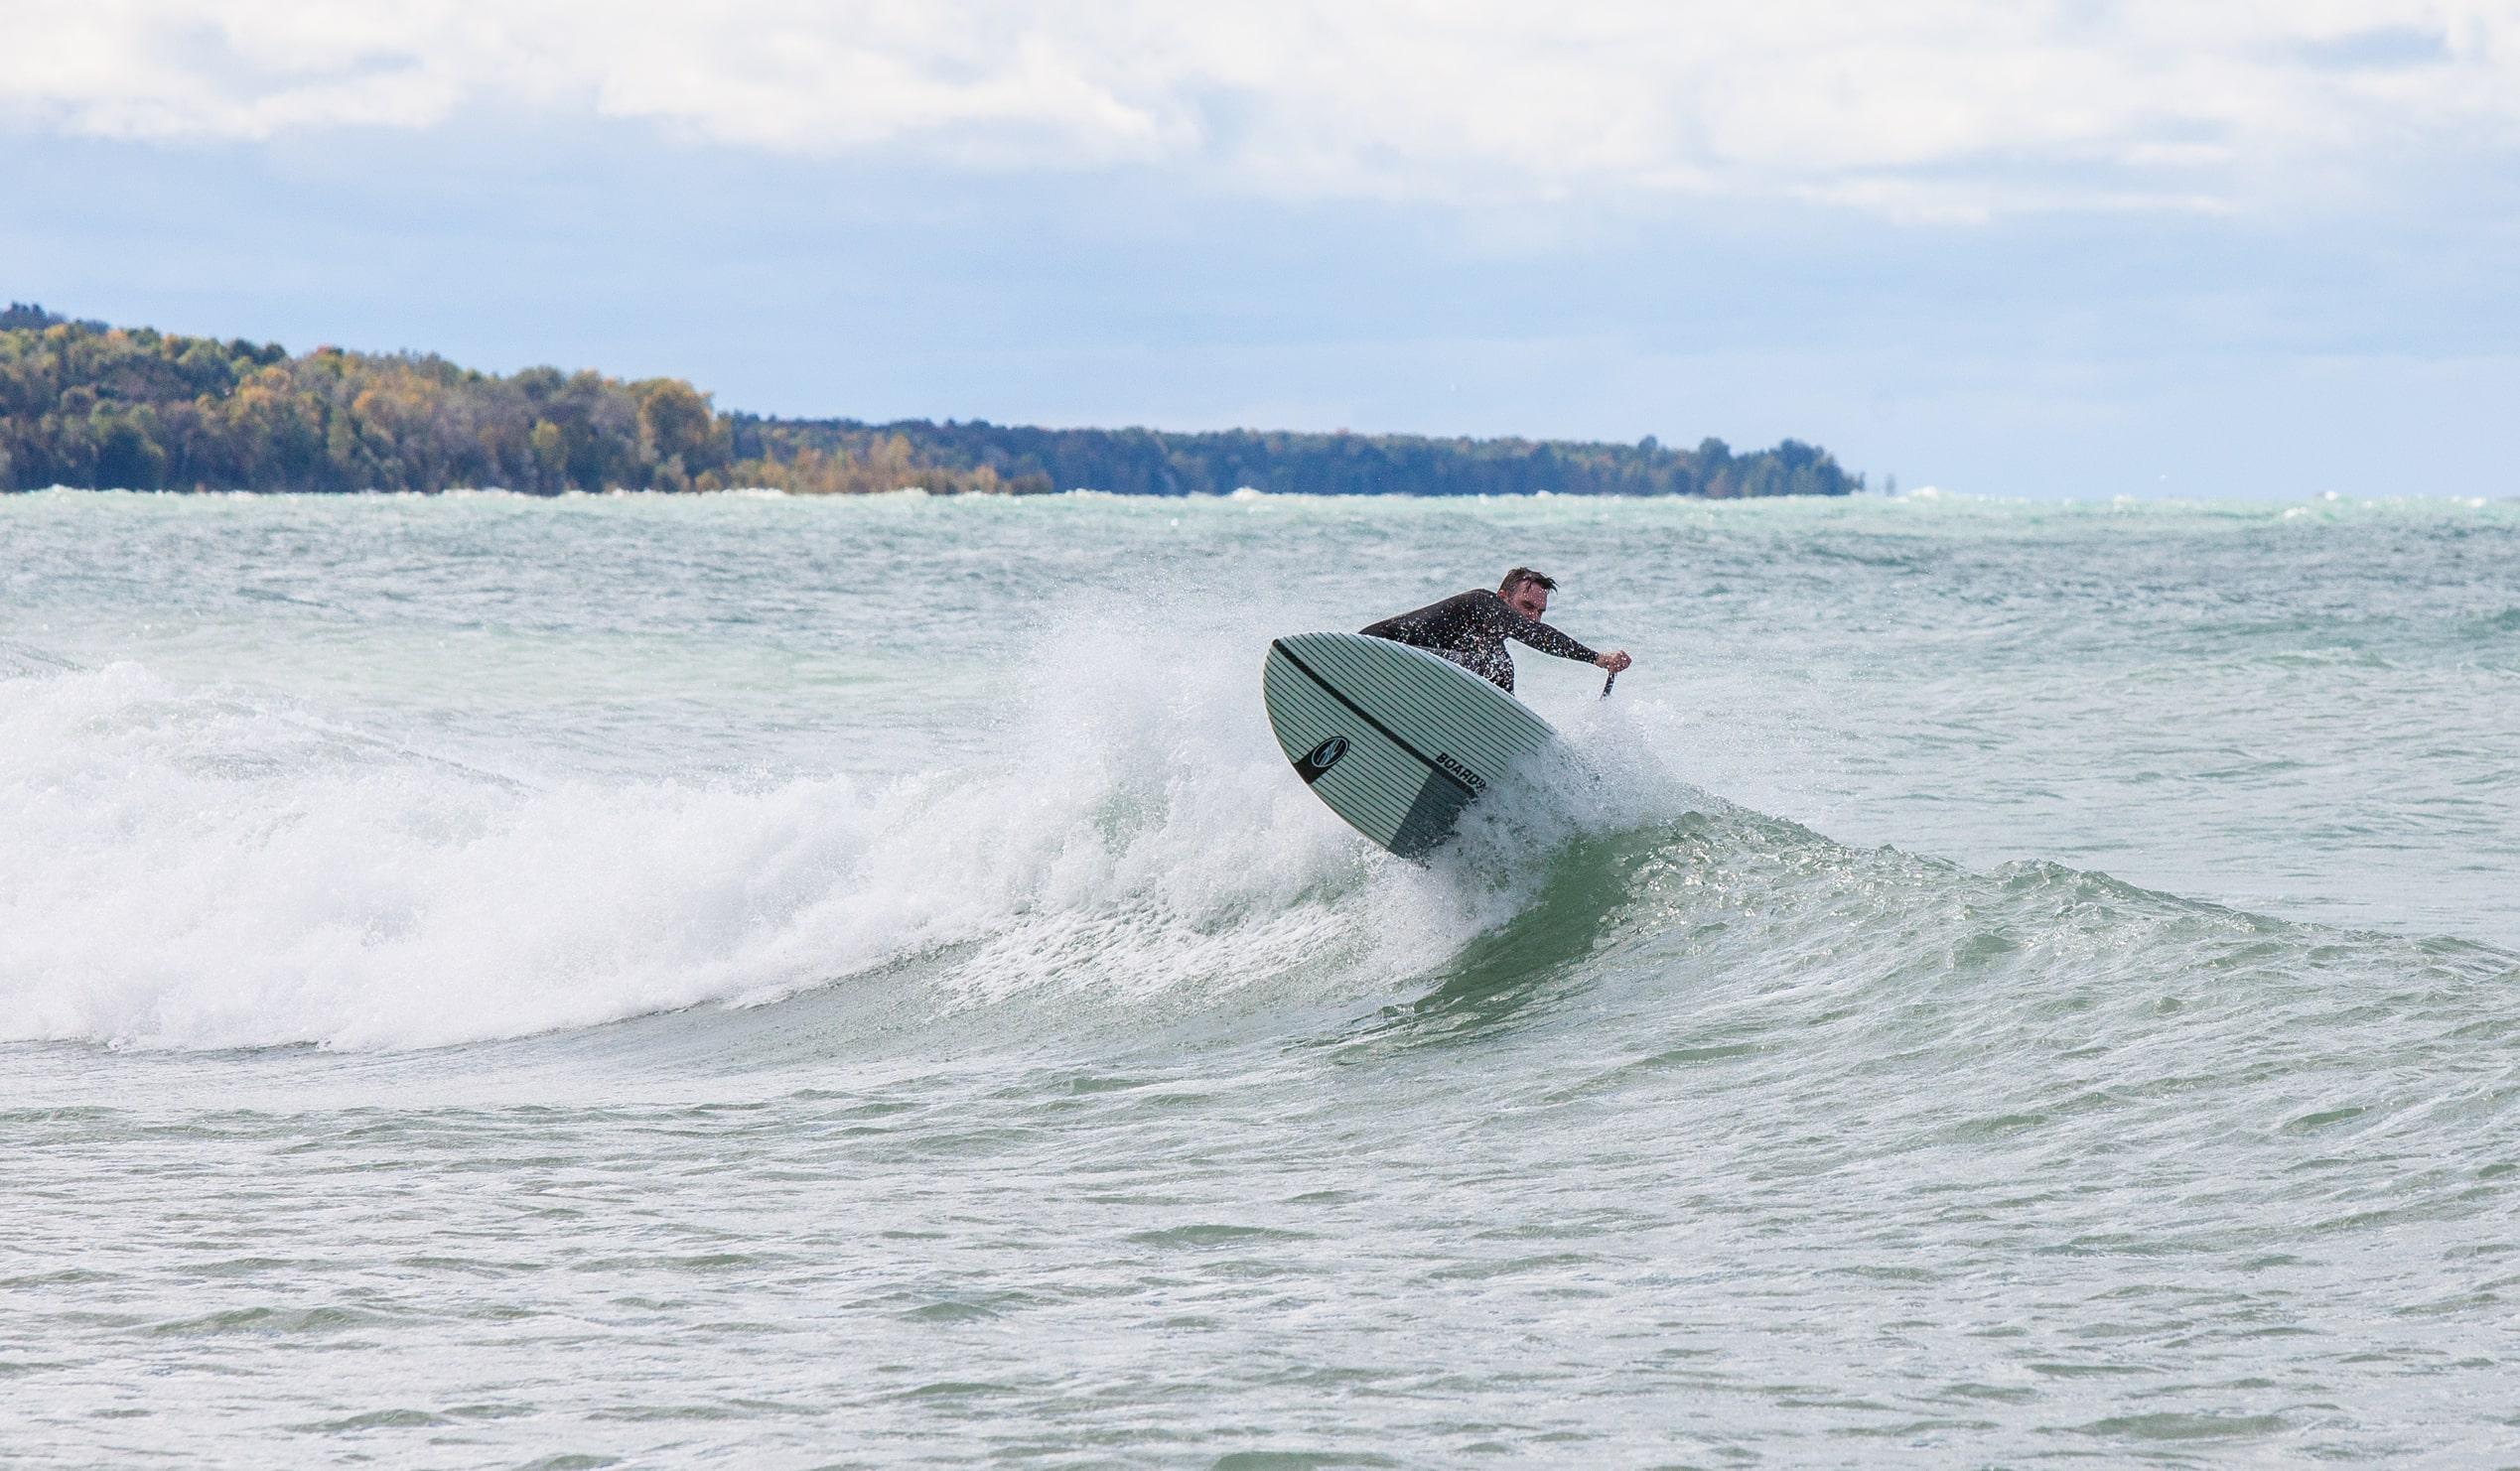 Man surfing on a lake